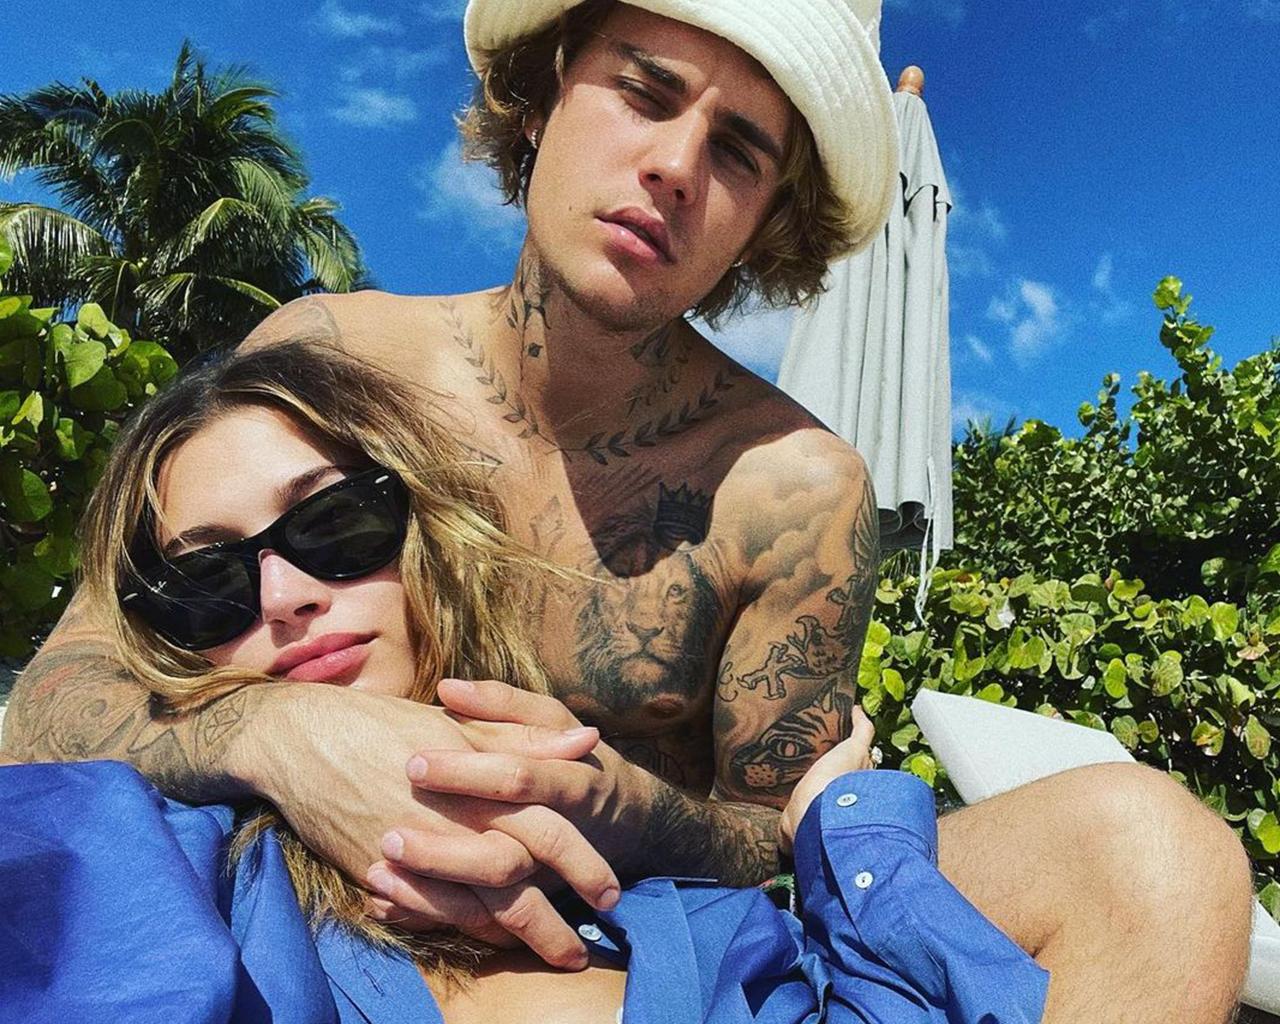 Hailey-Bieber's-self-care-and-wellness-rituals